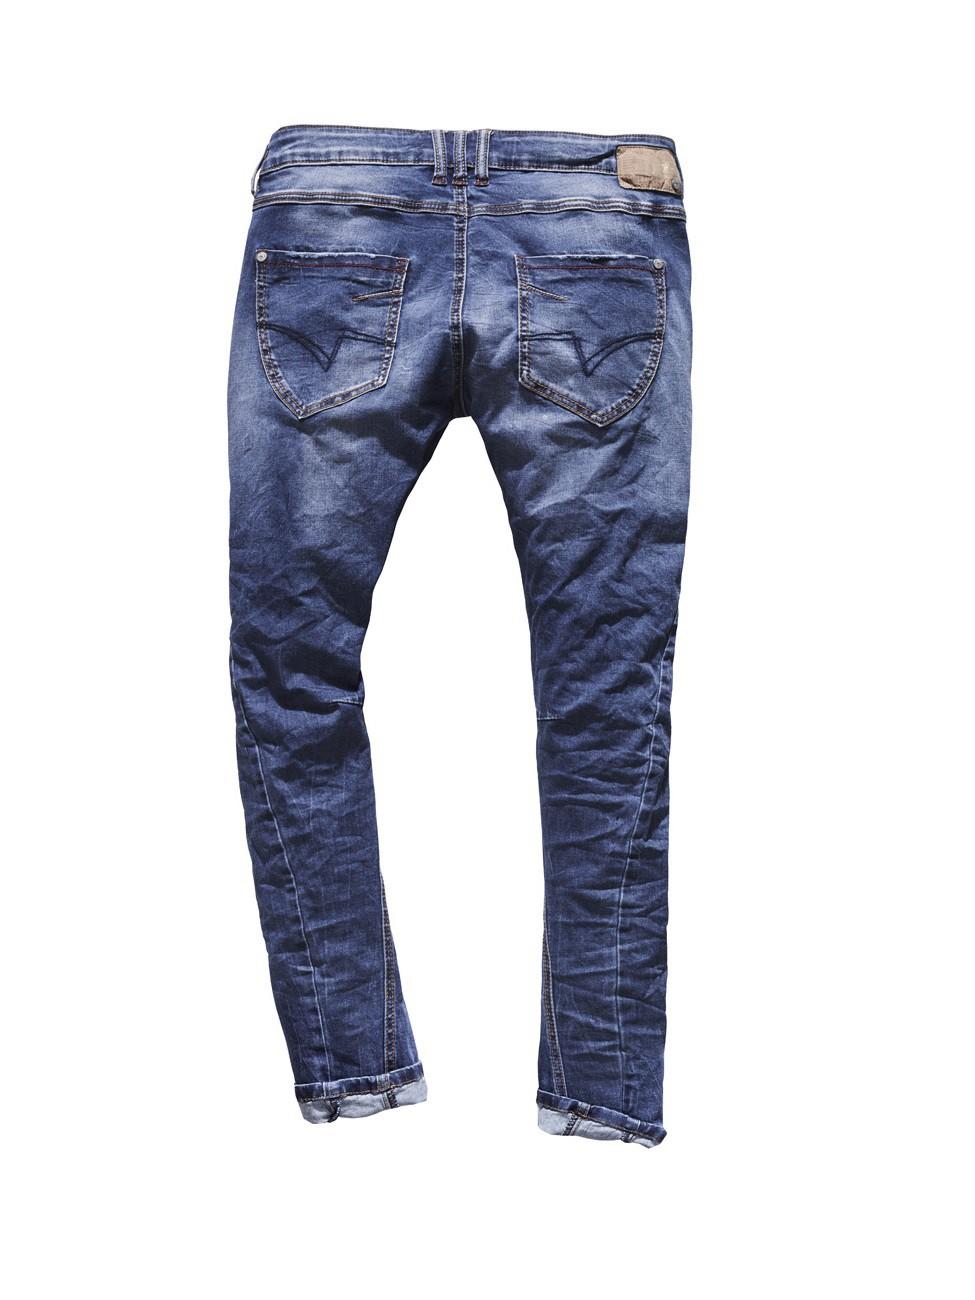 timezone damen jeans rivatz 16 5489 slim fit shell blue wash ebay. Black Bedroom Furniture Sets. Home Design Ideas